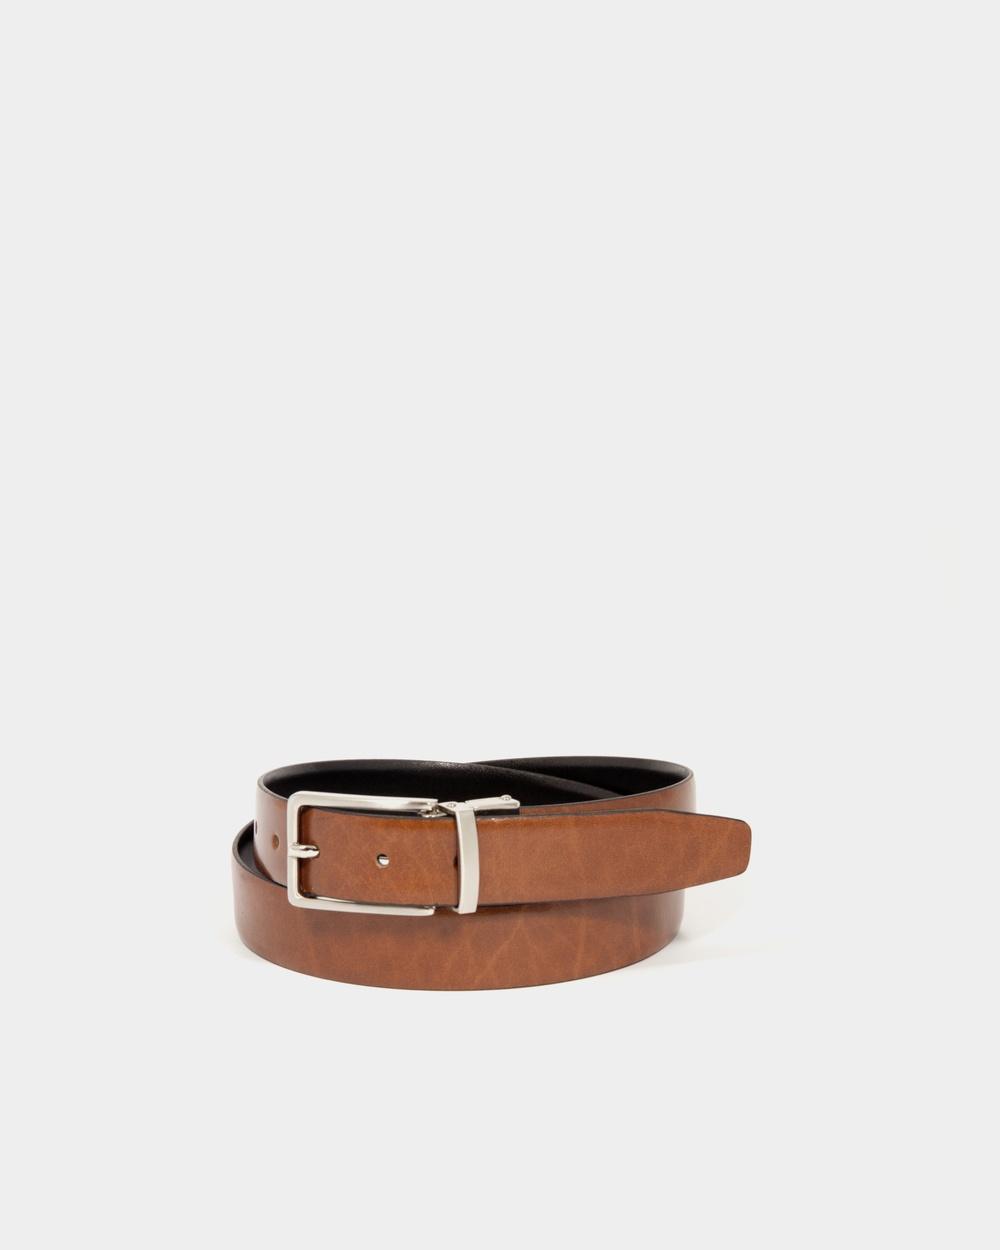 Loop Leather Co Benson Belts Tan/Black